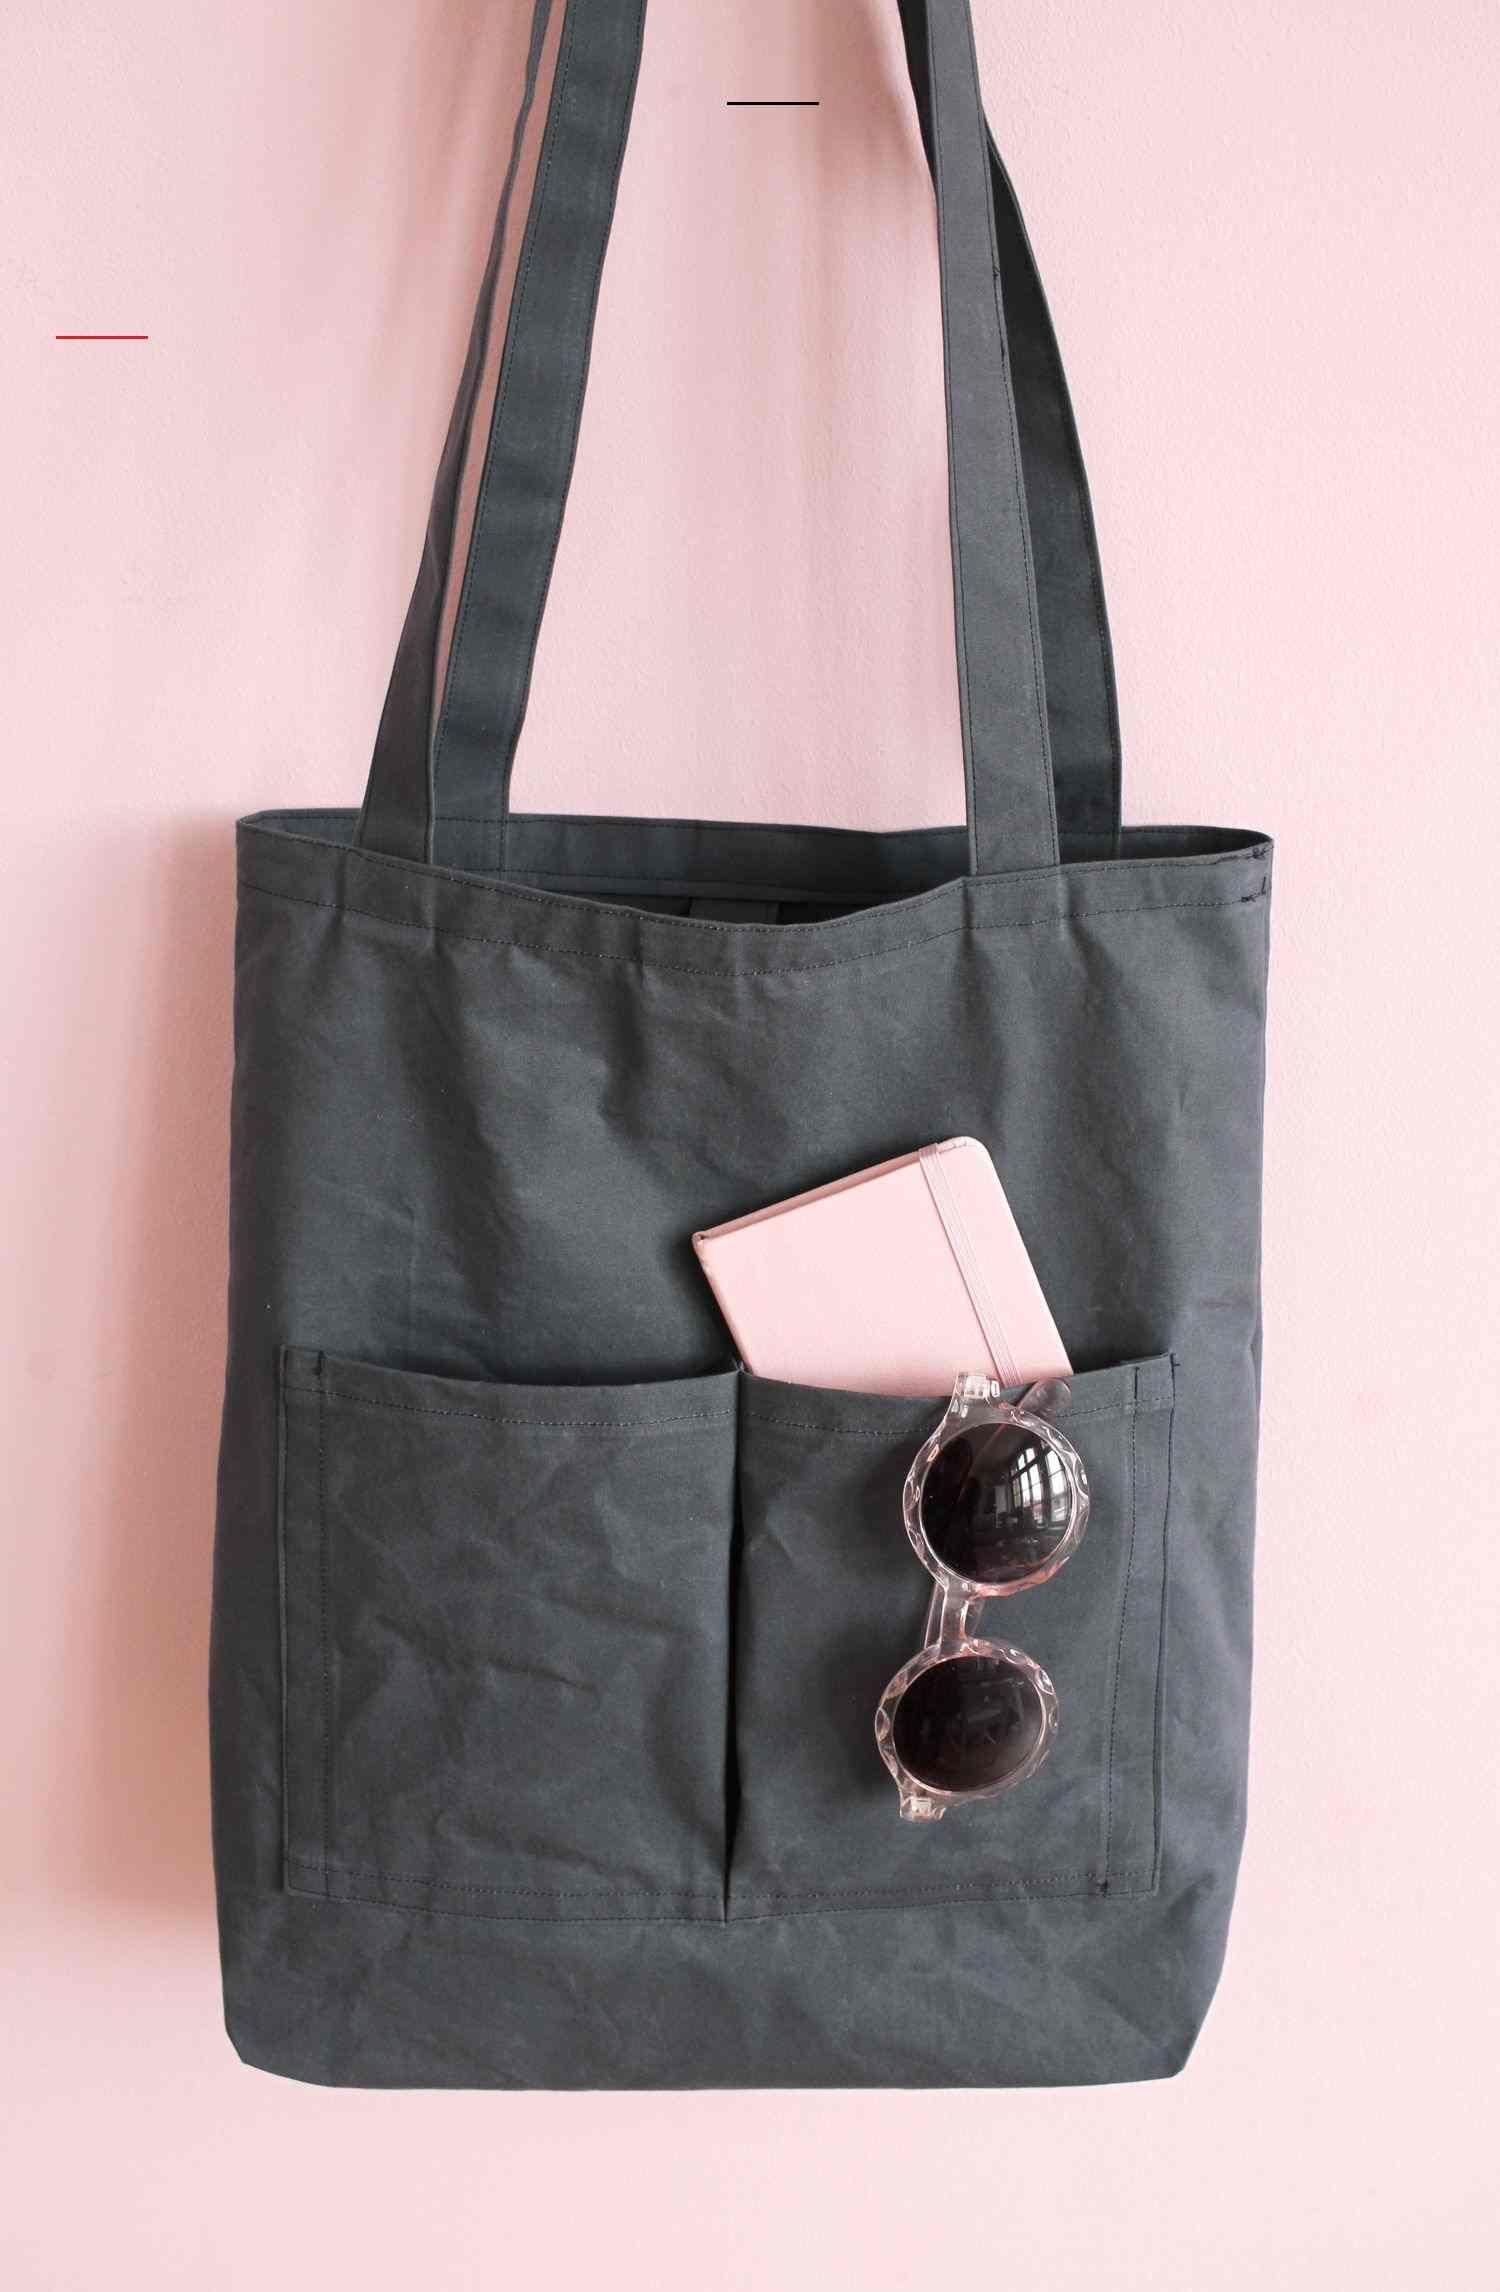 Modezumselbermachen Winkeltas Tote Bag Grote Tassen